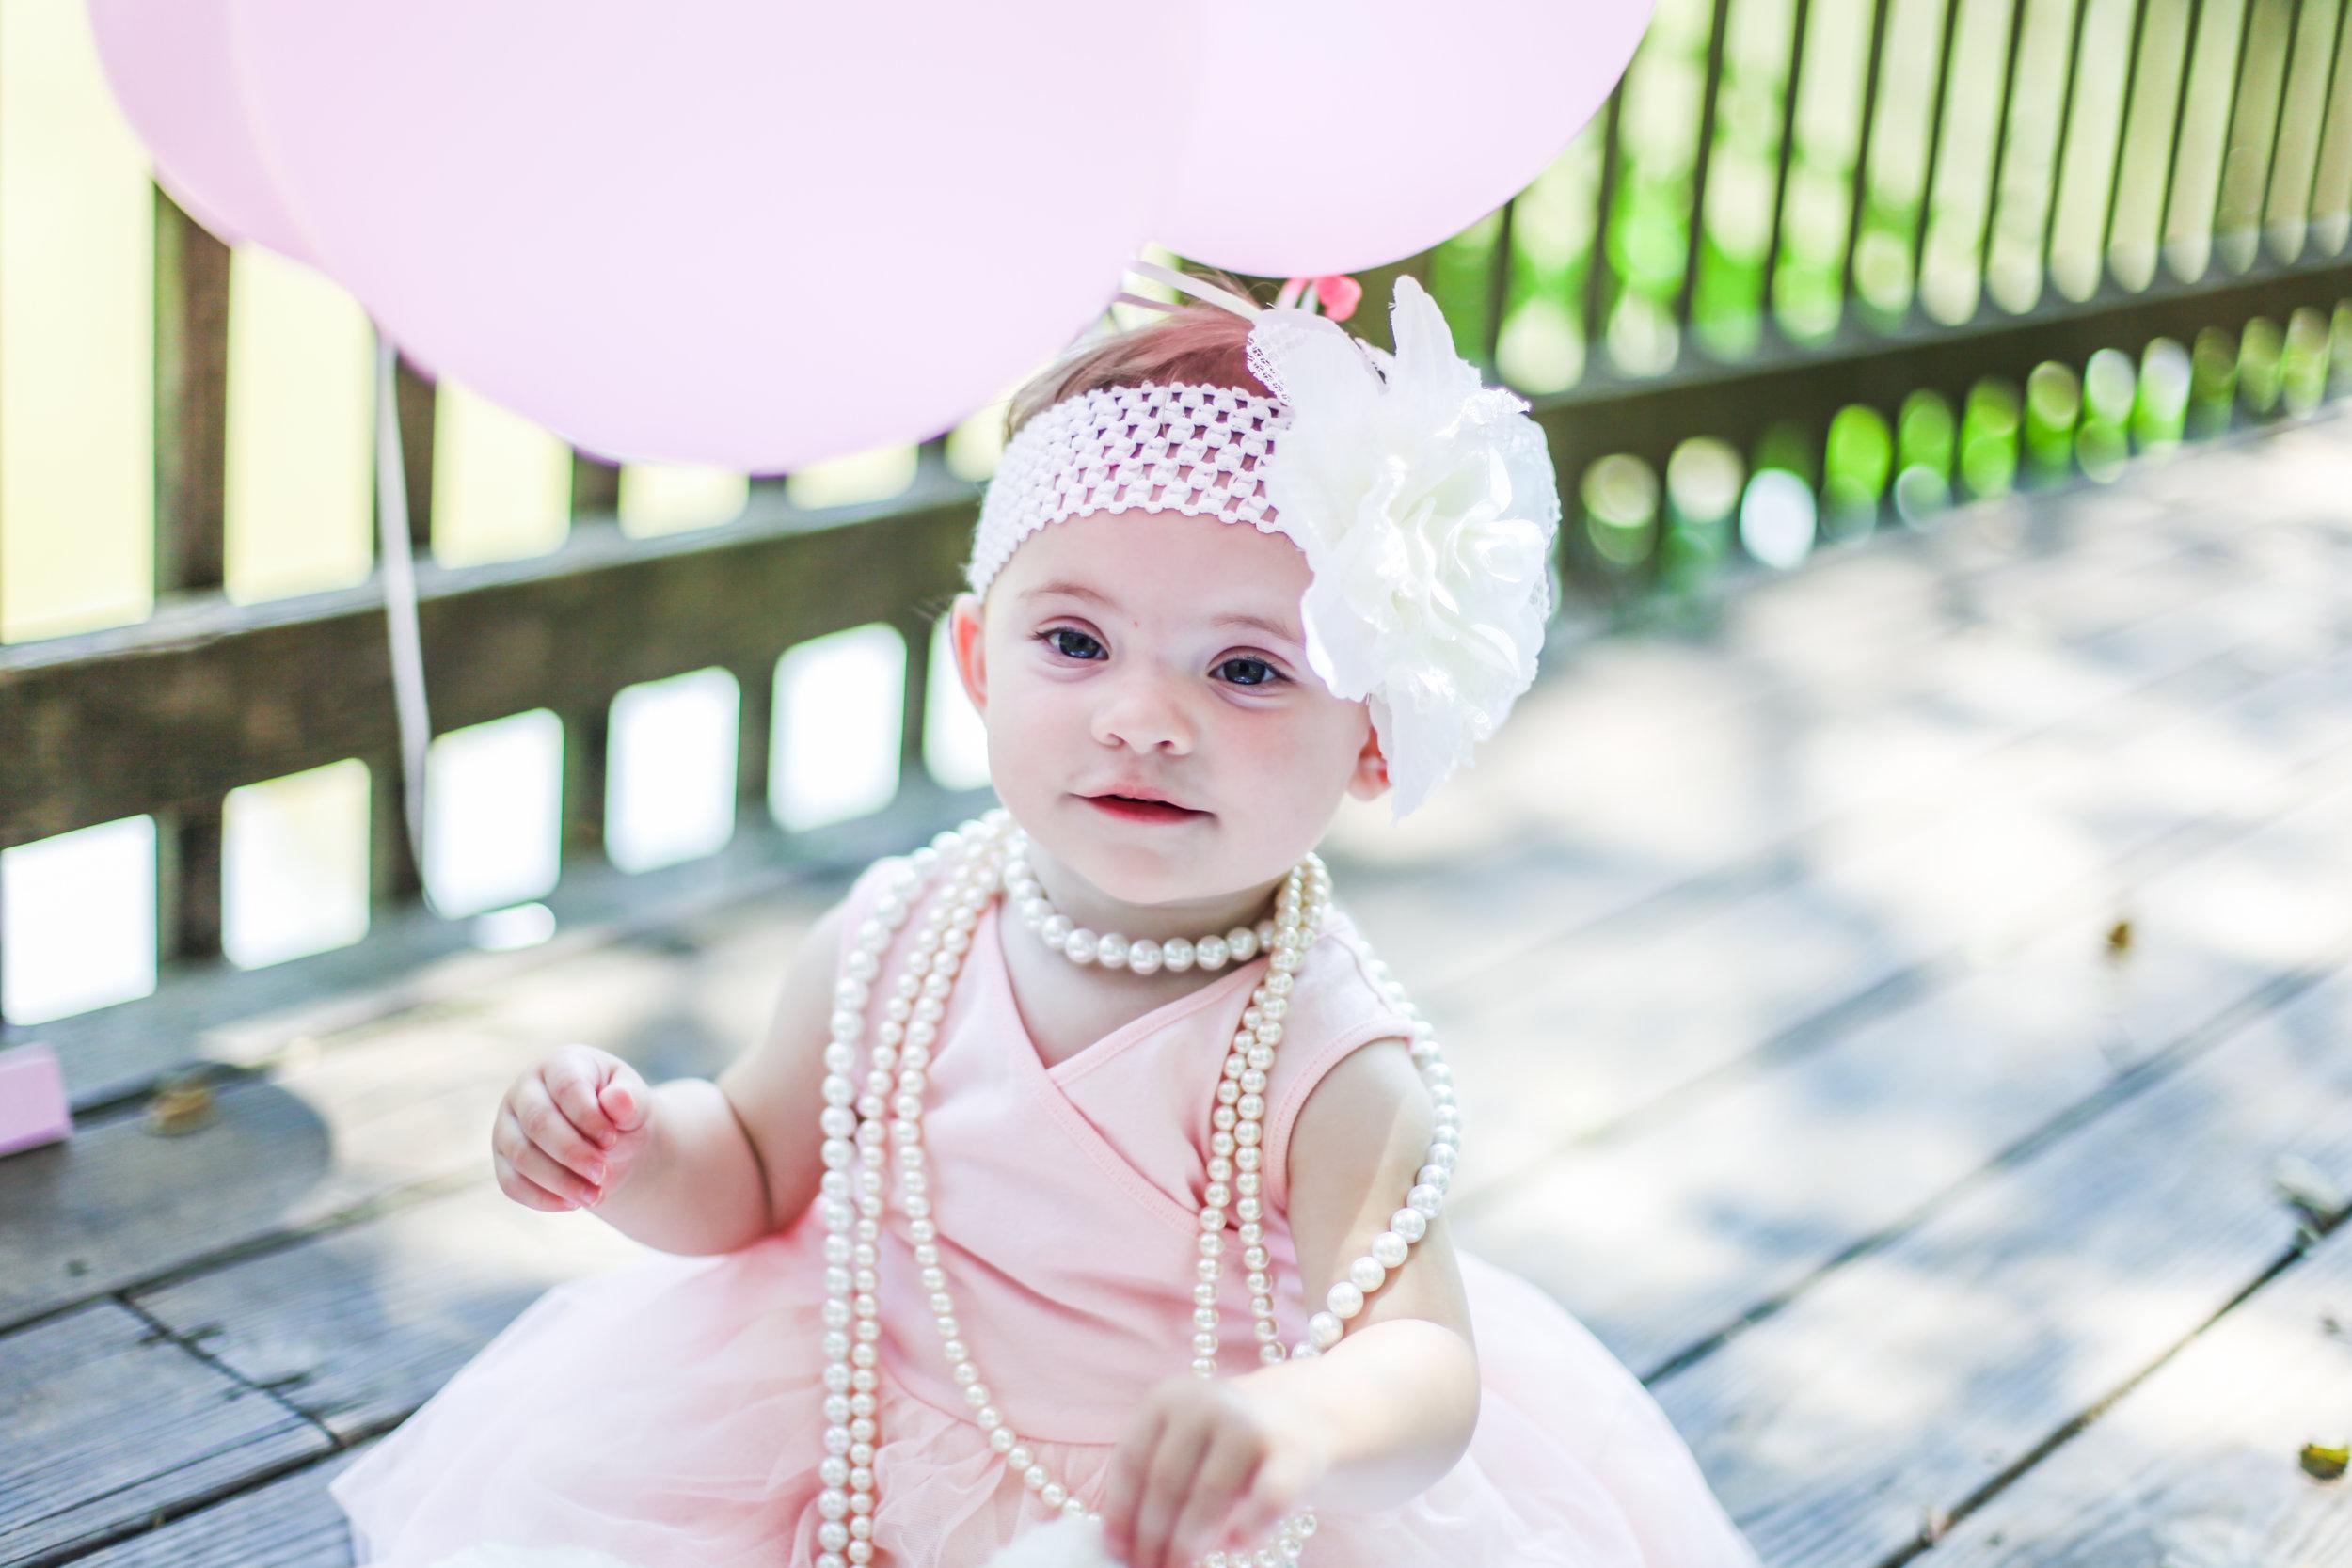 woodstock baby photography angela elliott-35.jpg